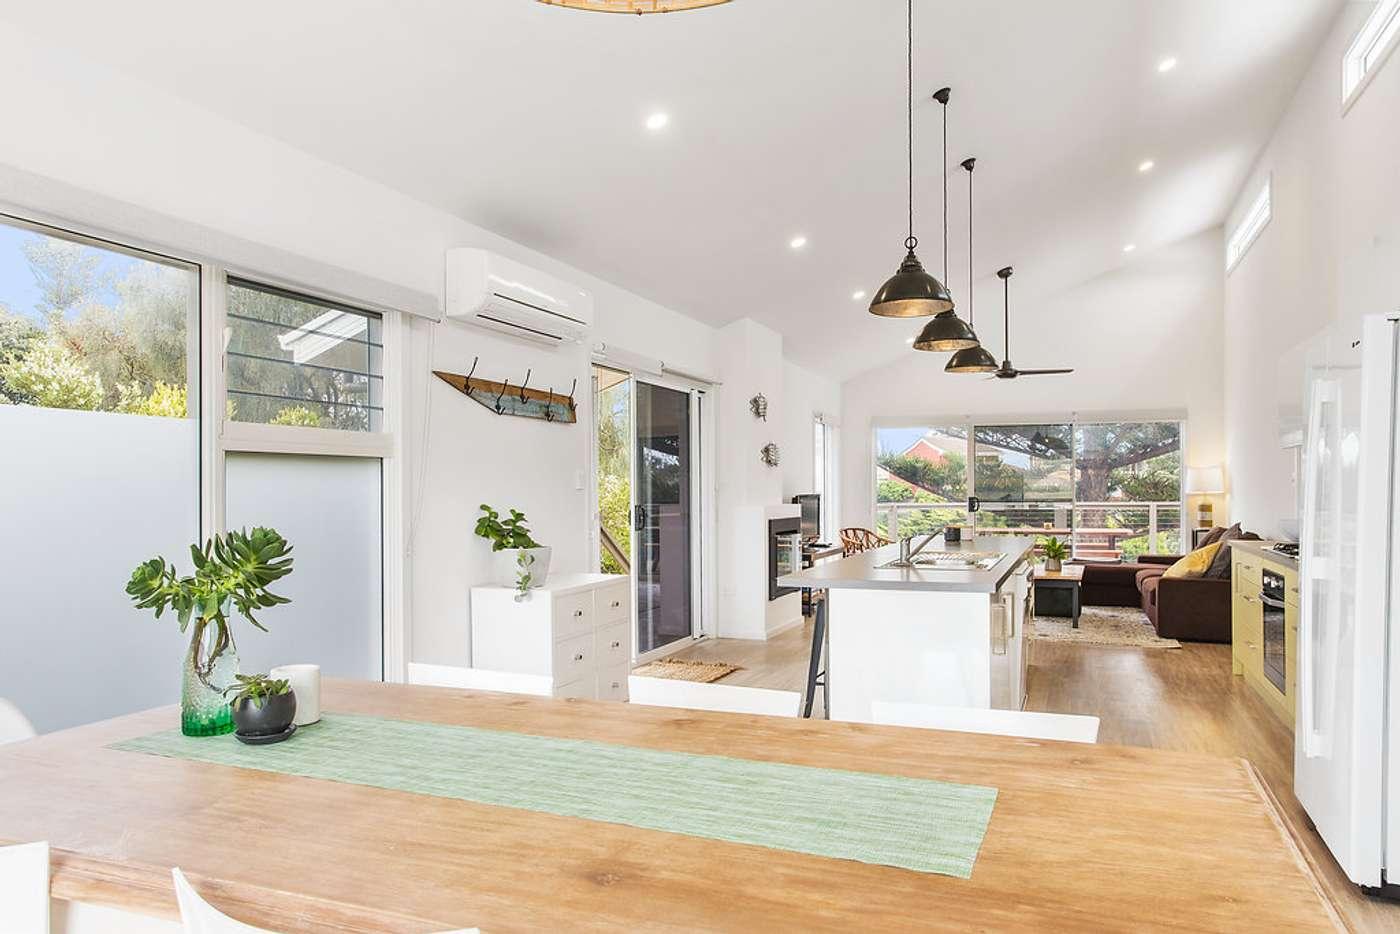 Main view of Homely house listing, 59 Ningana Rd, Aldinga Beach SA 5173